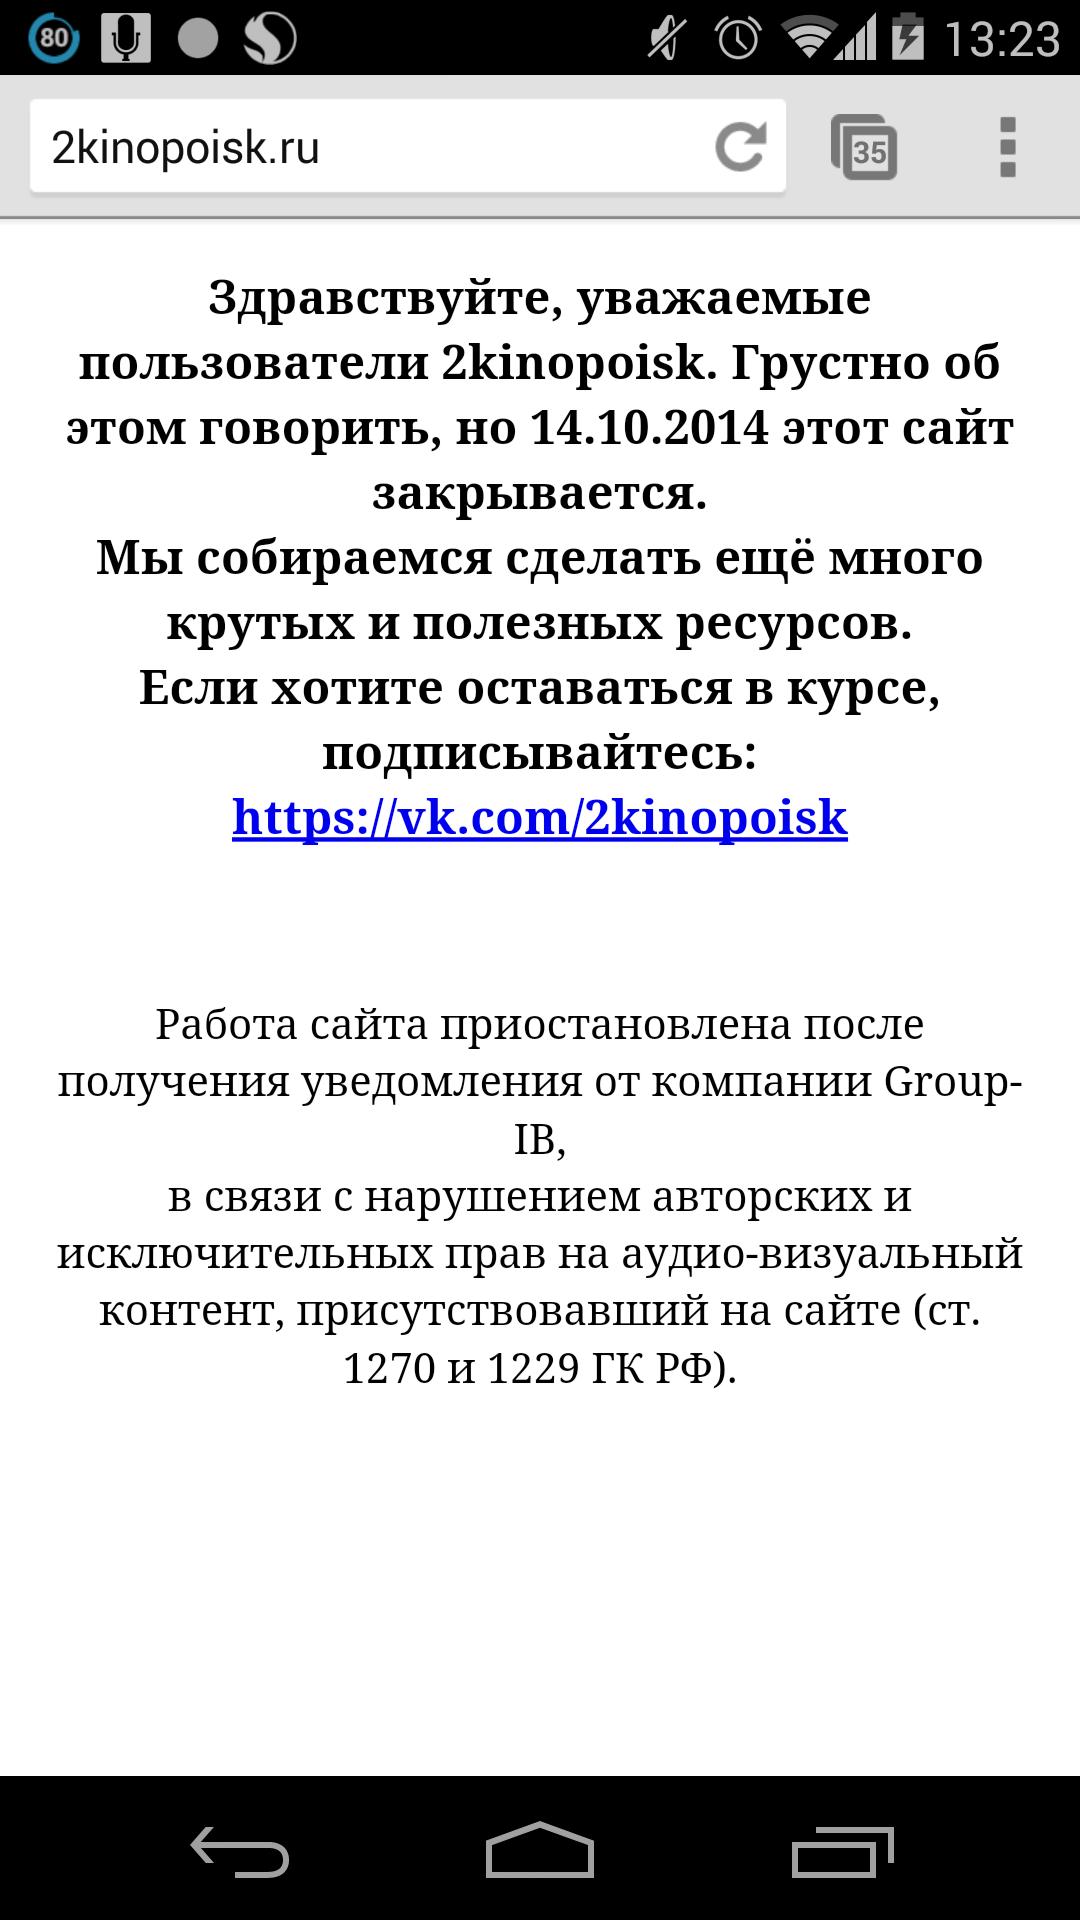 2kinopoisk.ru — anti-piracy, Group-IB